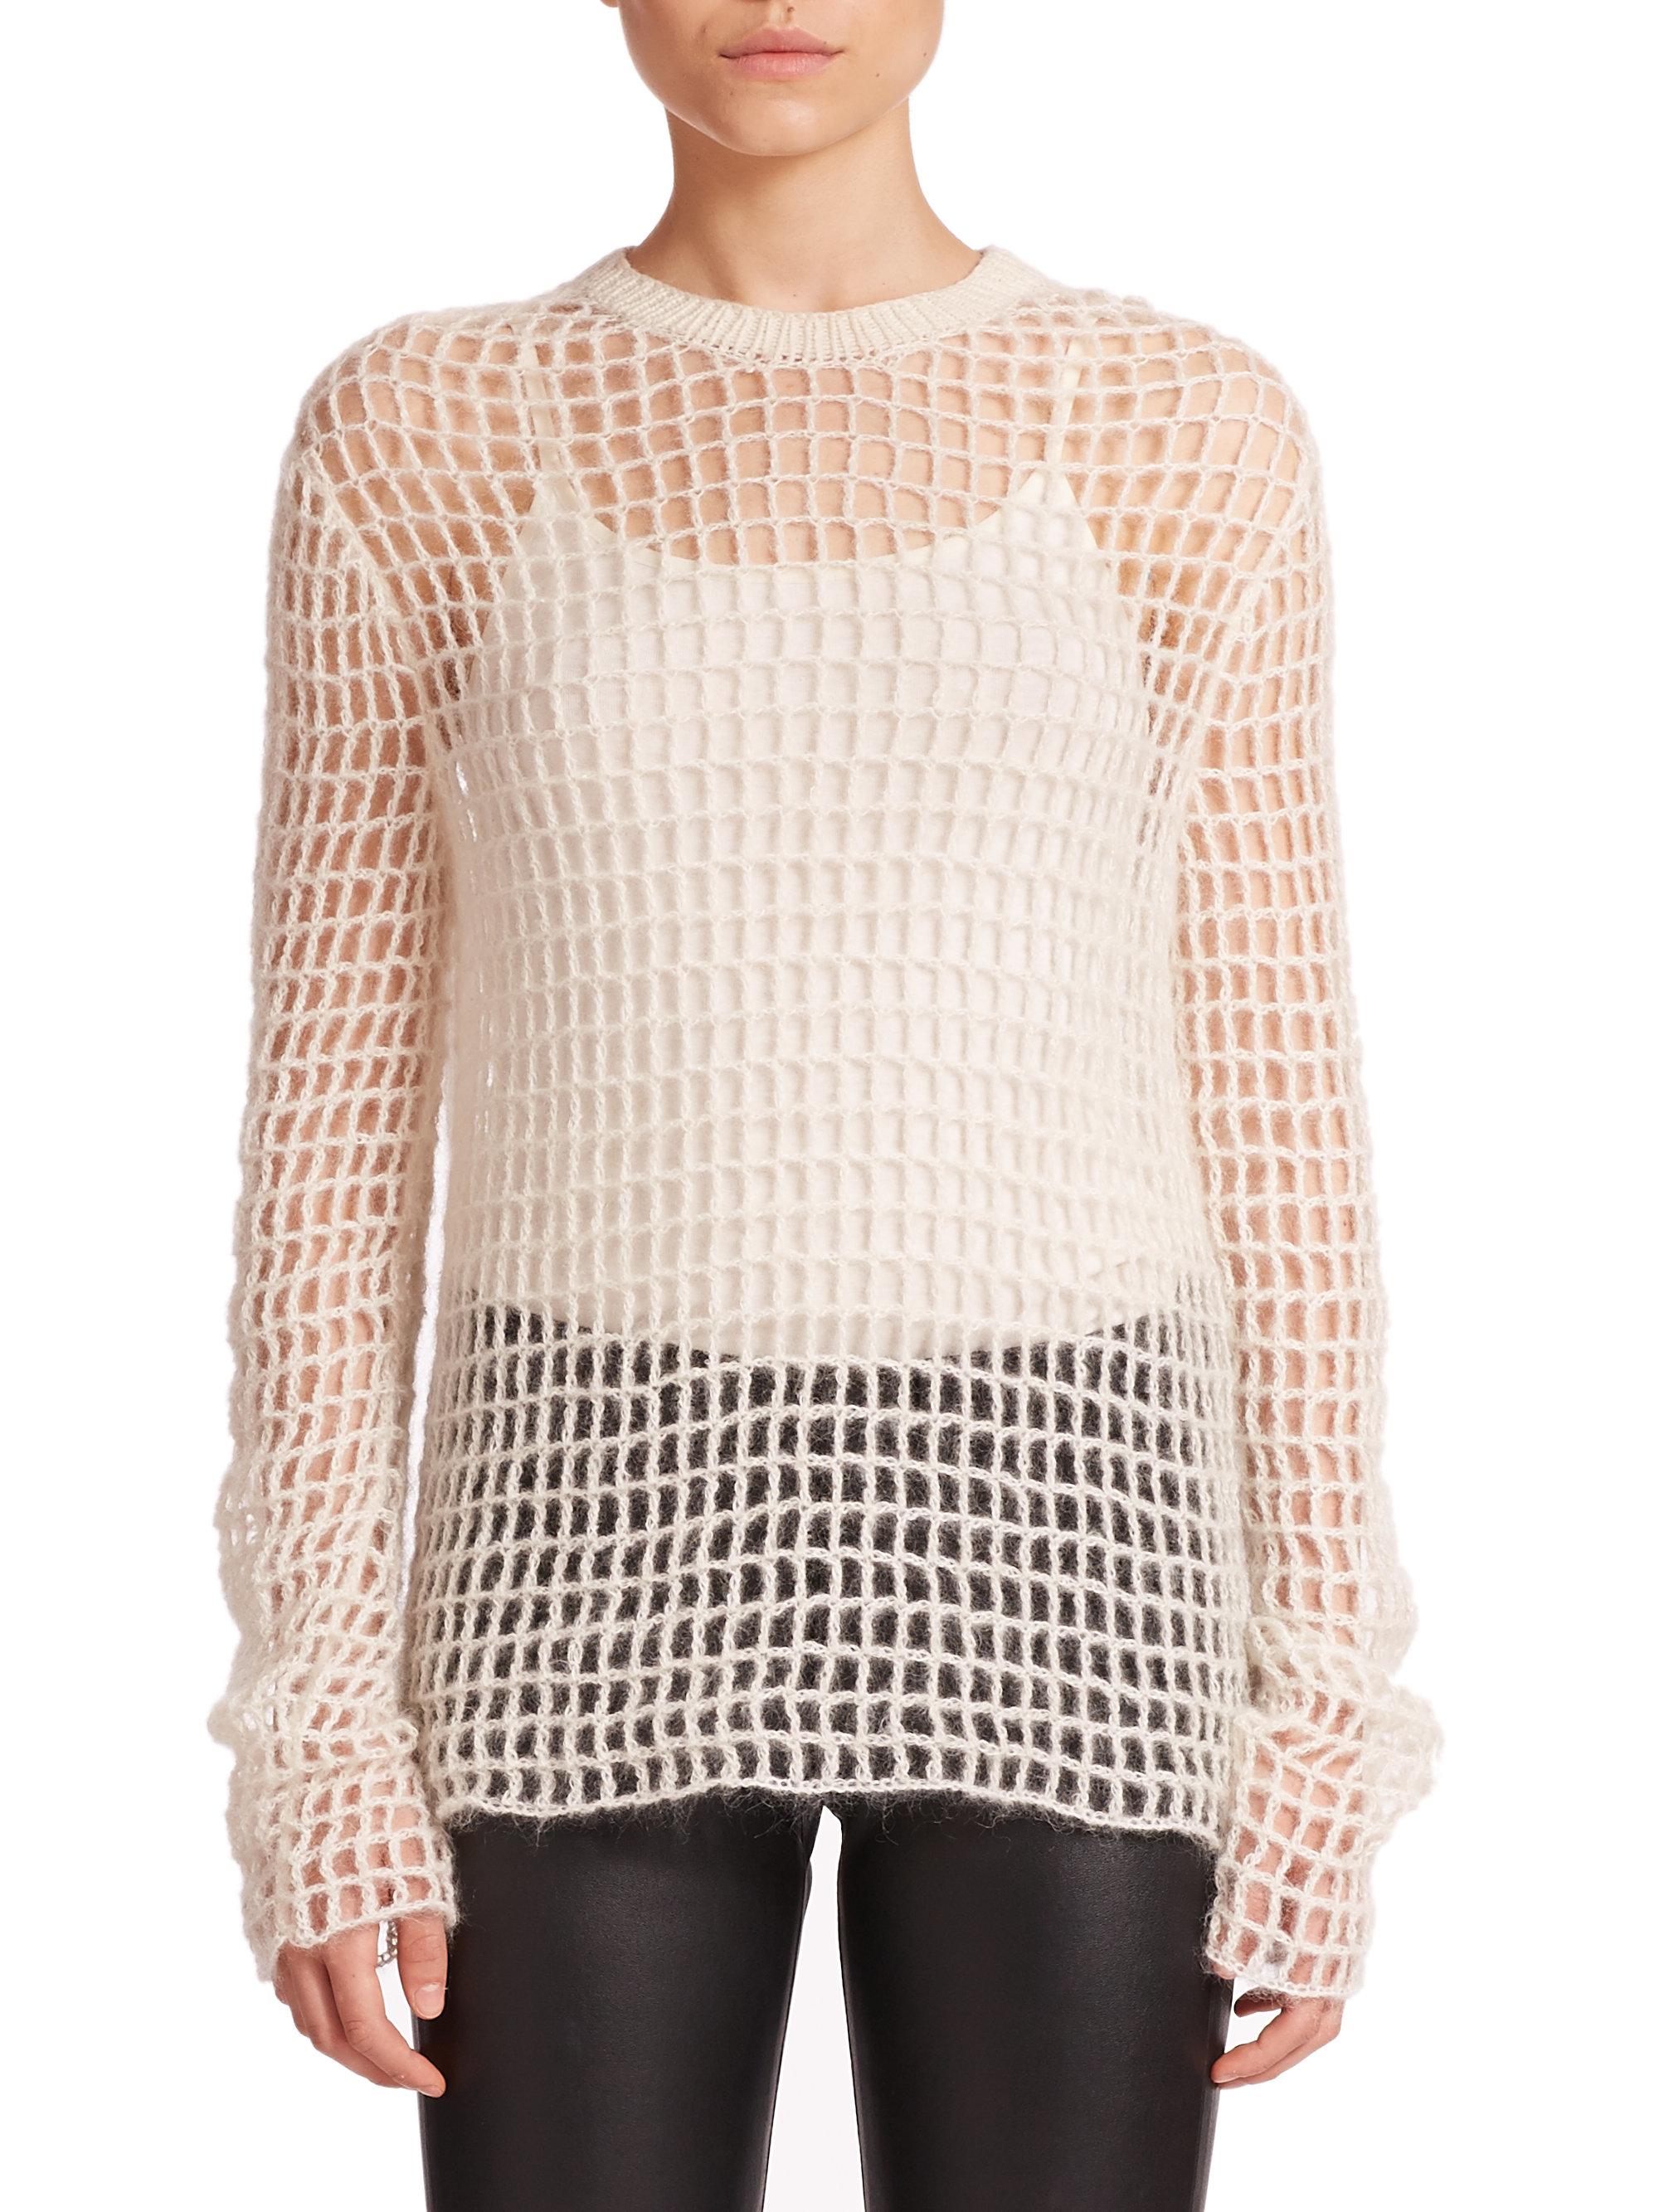 5be0712fae033 Lyst - Helmut Lang Hand-knit Crochet Sweater in White